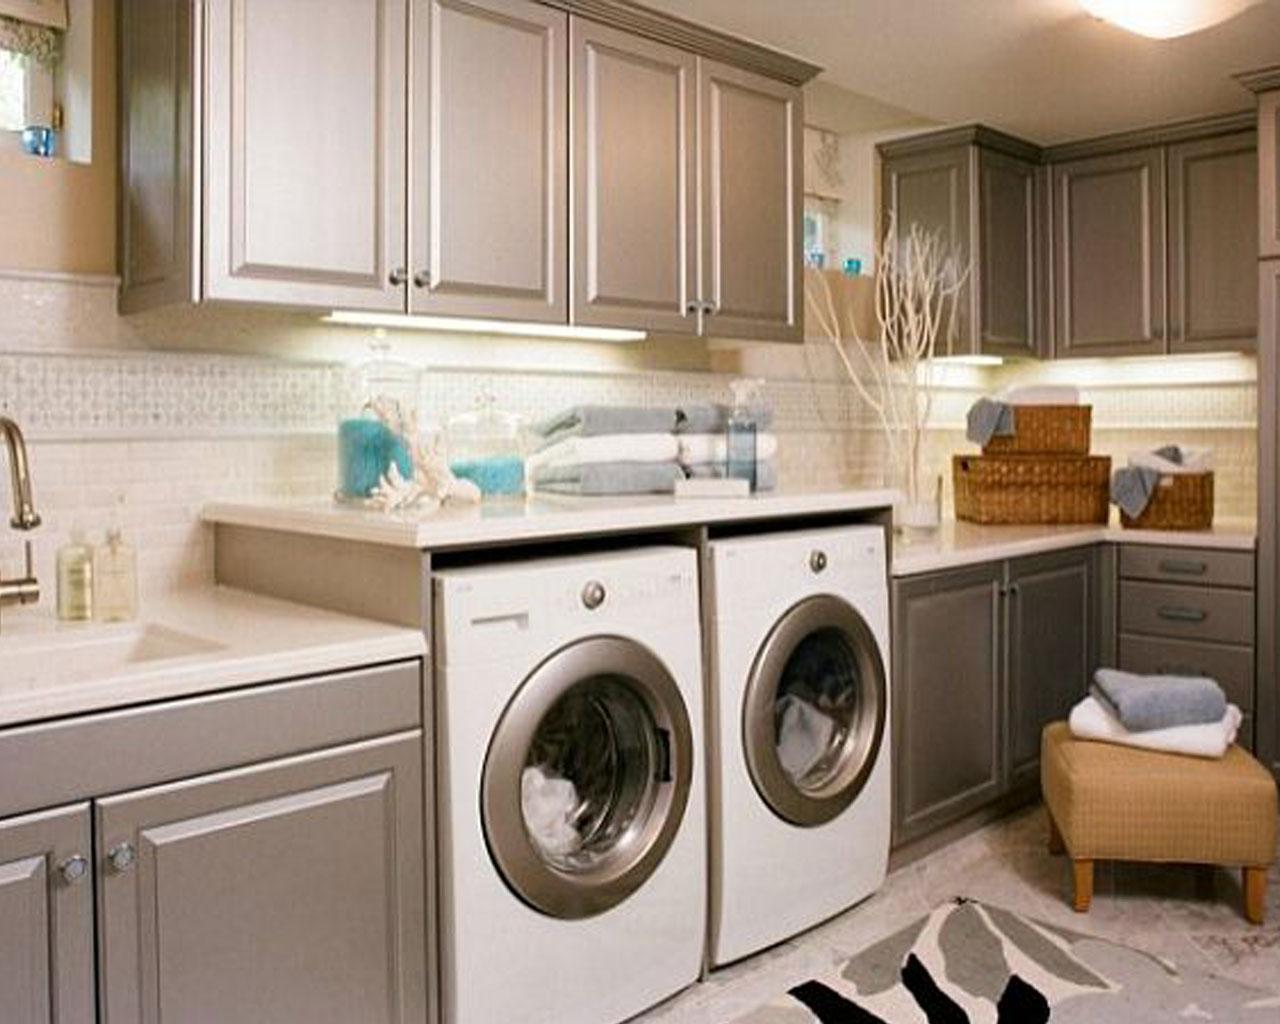 Laundry Room Design Ideas | SMJ Construction